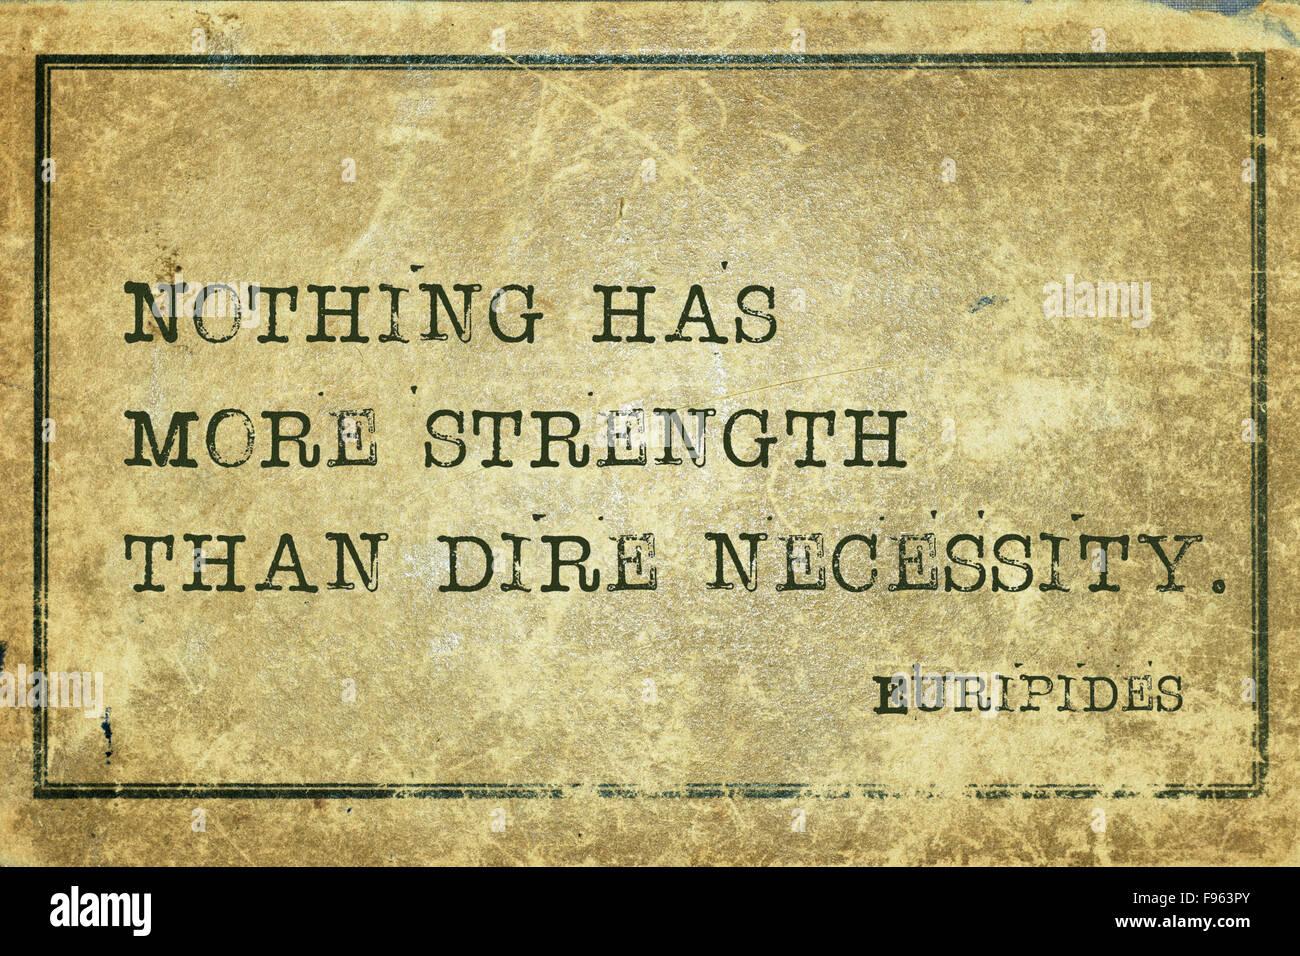 Euripides necessity